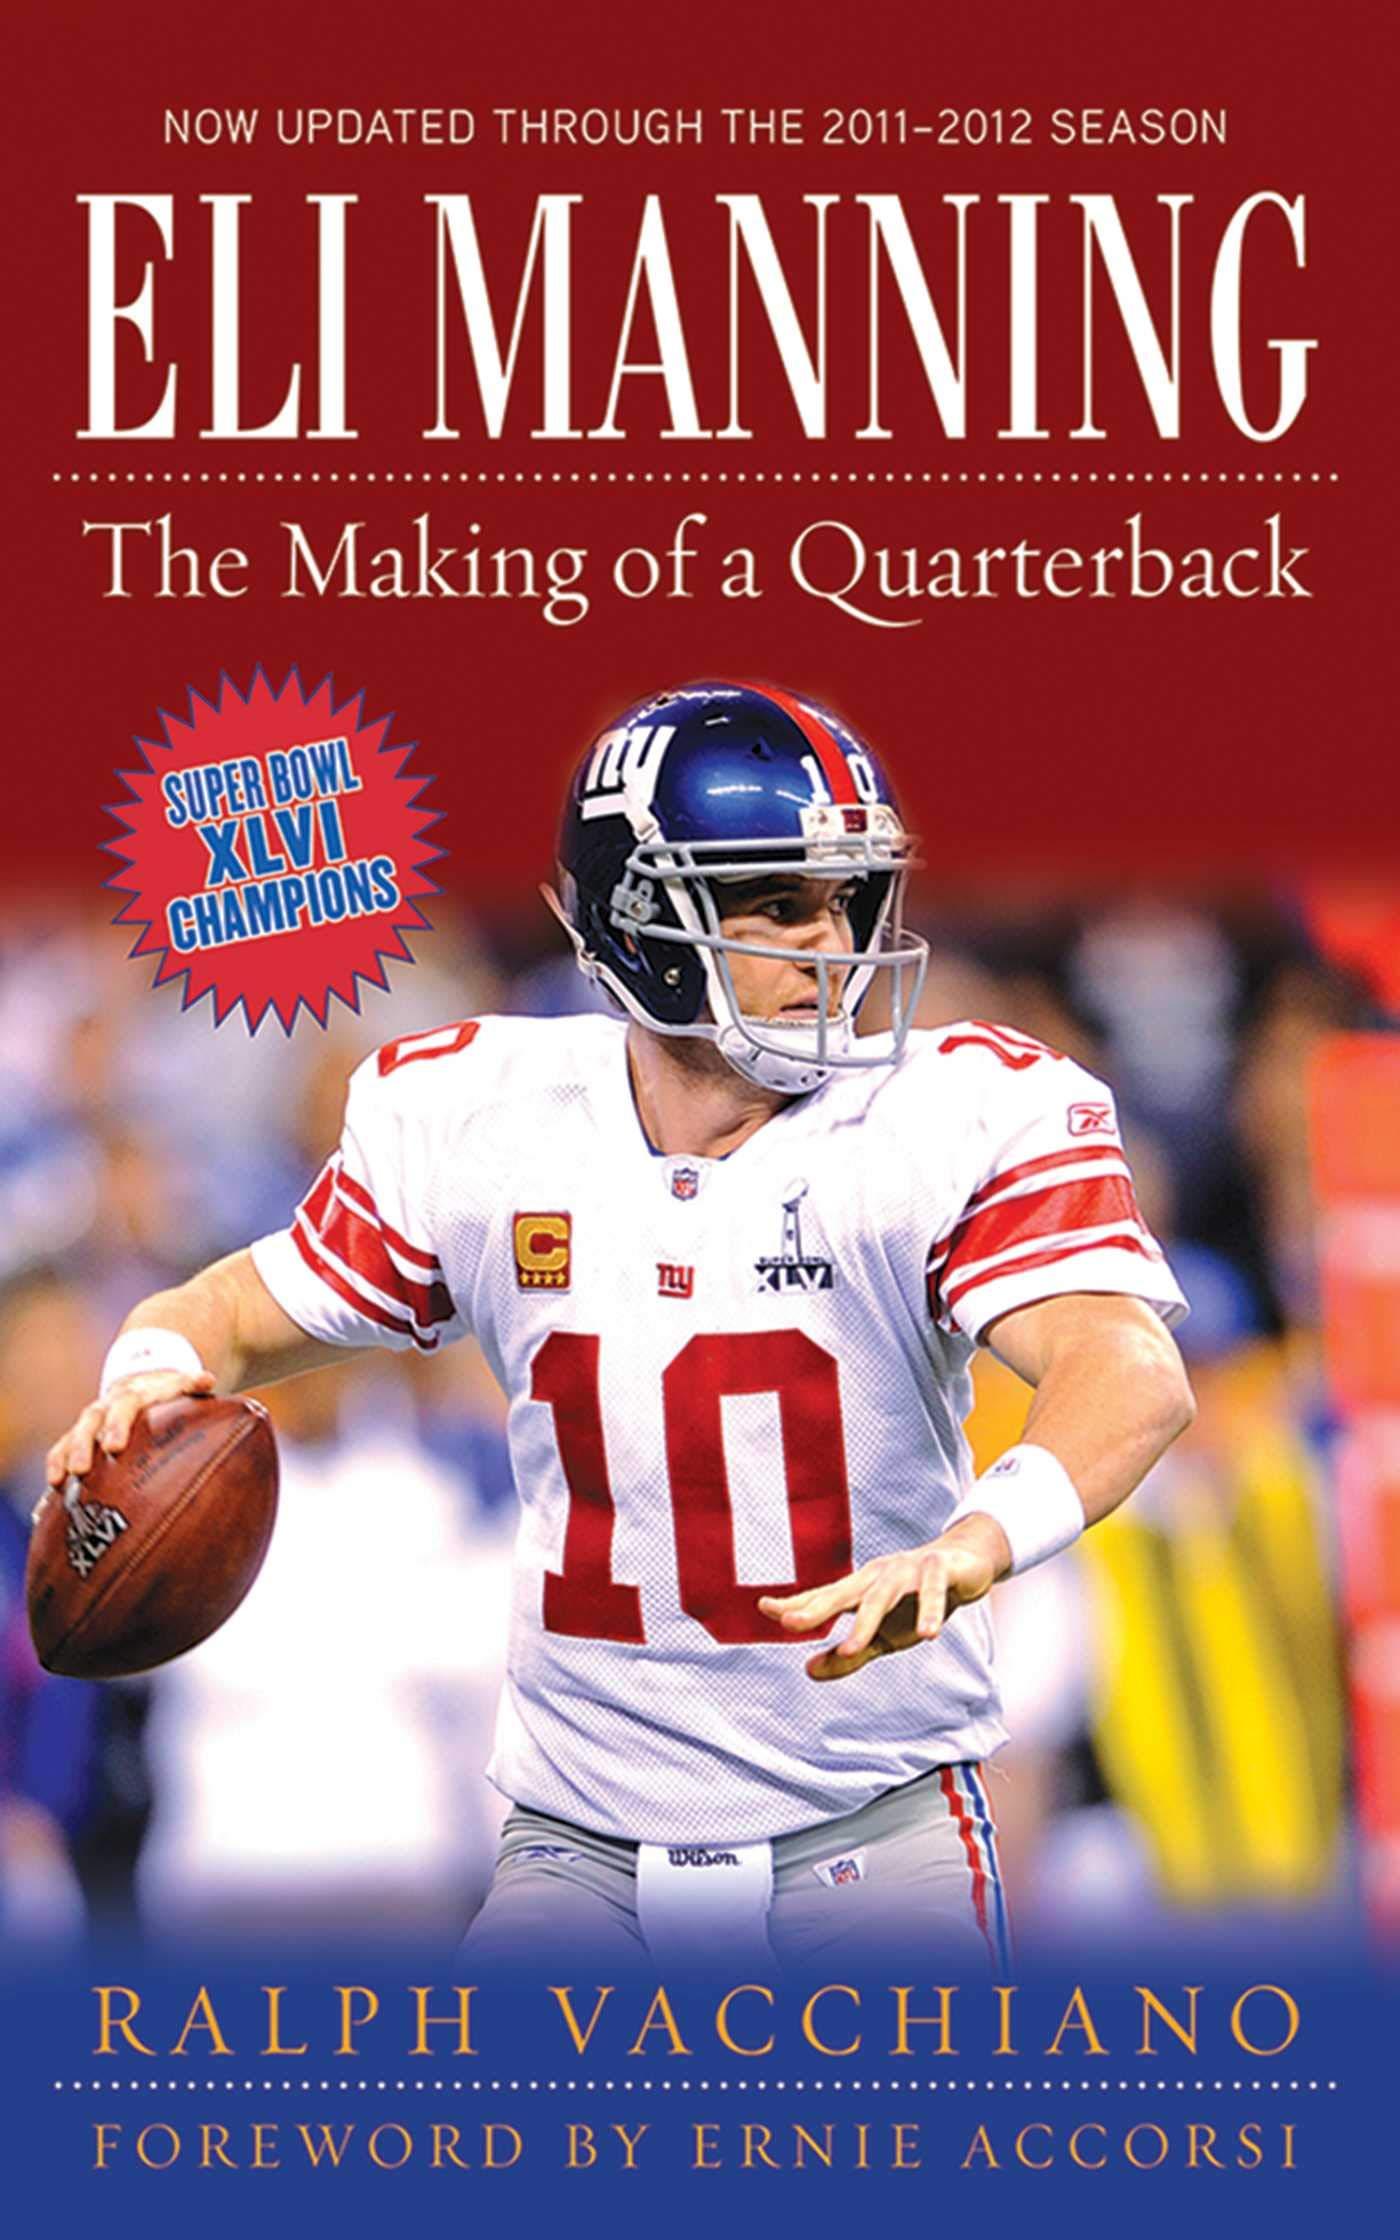 info for 4ead7 d7e0b Eli Manning: The Making of a Quarterback: Ralph Vacchiano ...